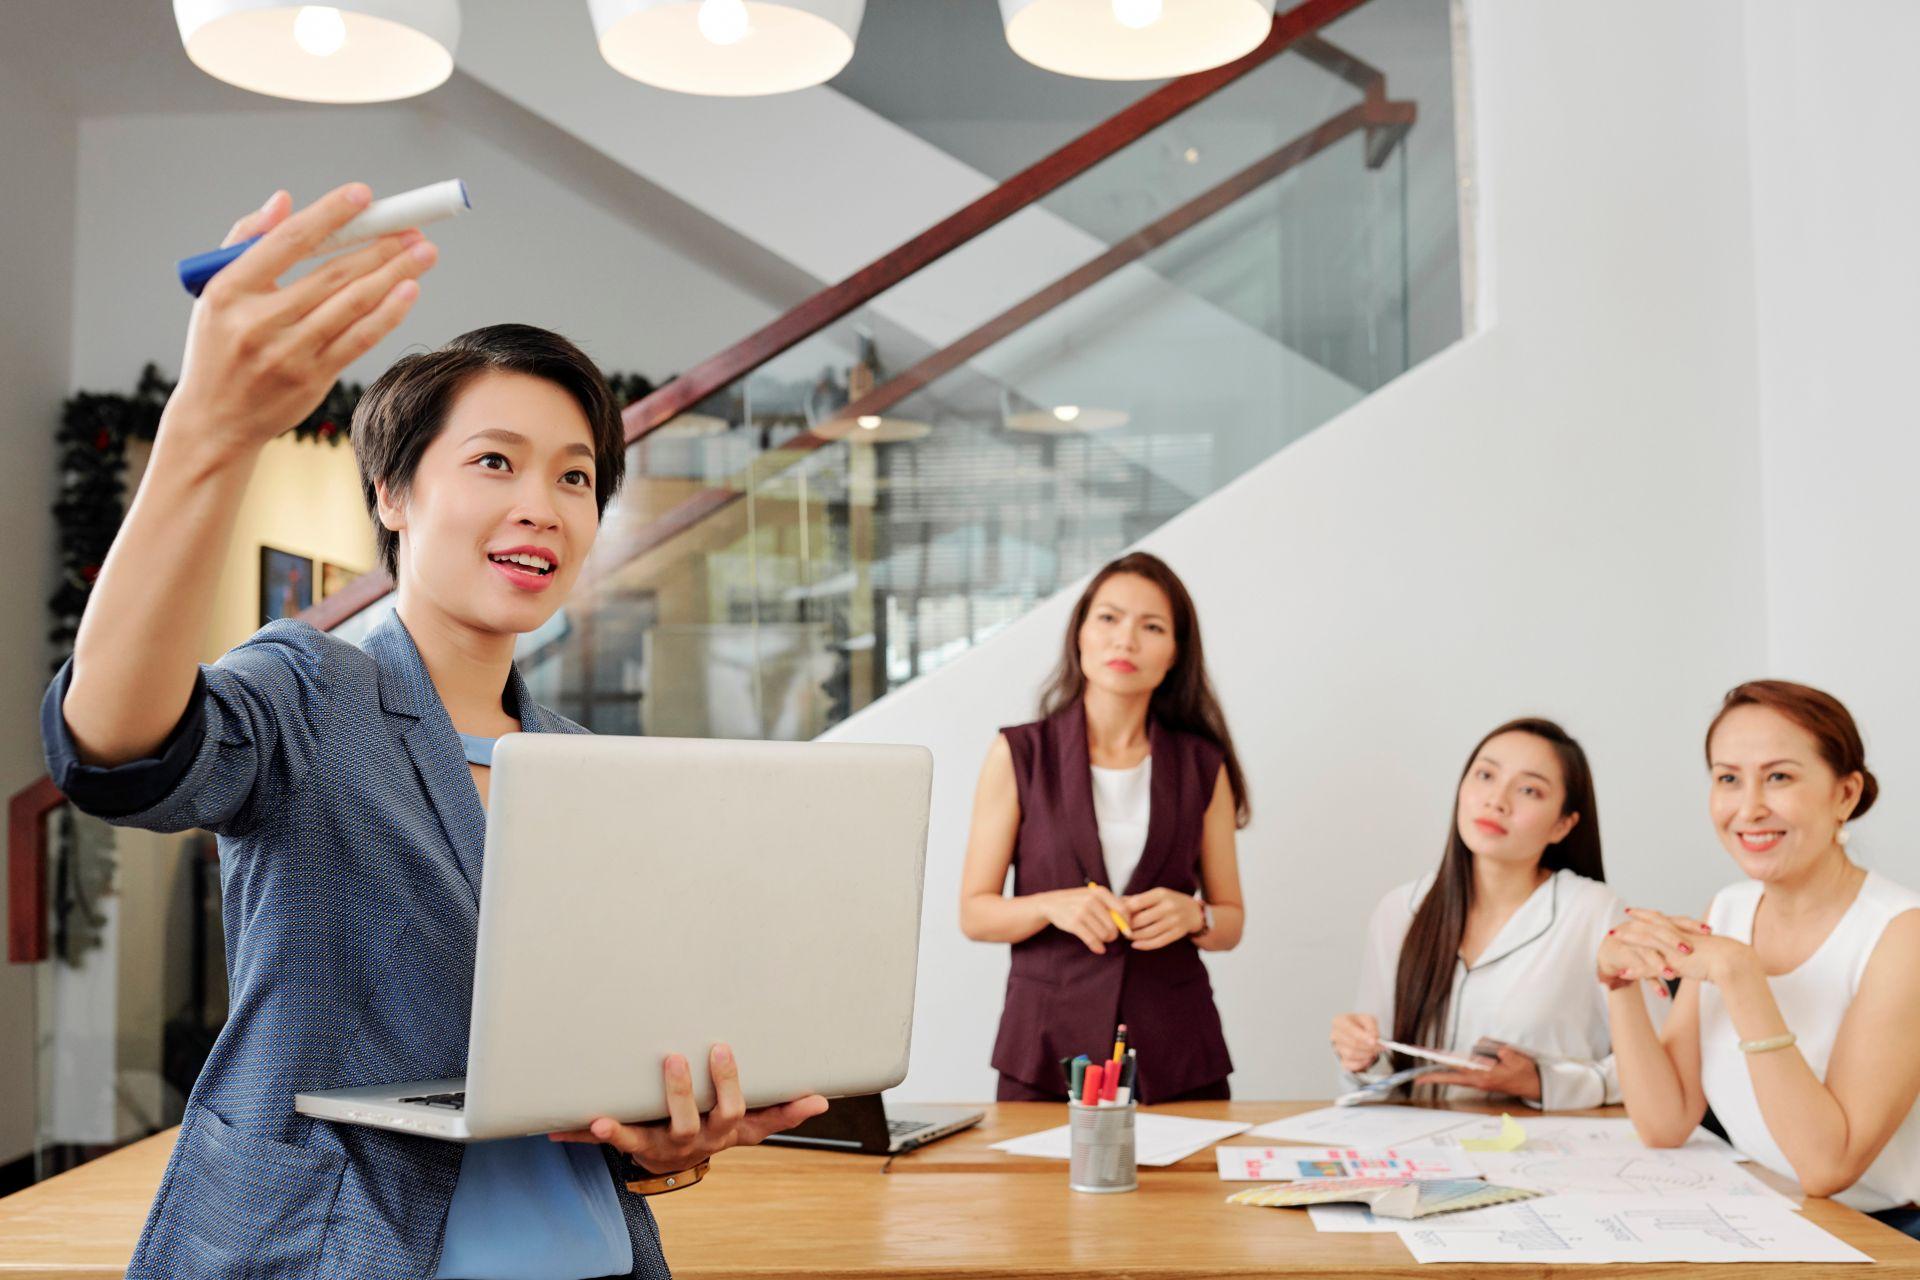 Delegating tasks to employees